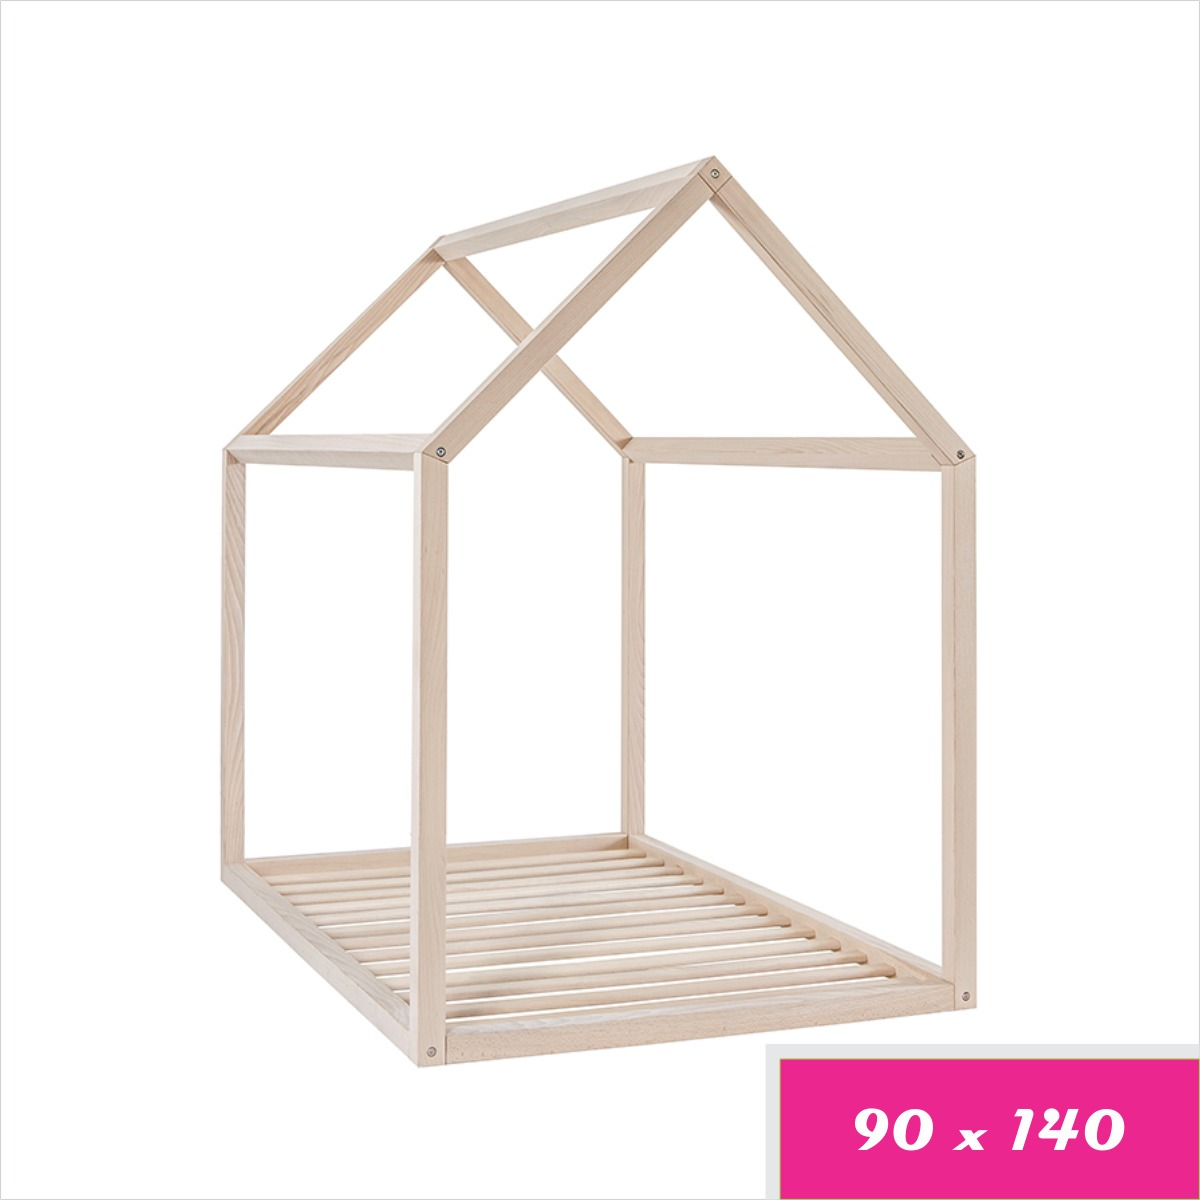 Cama Cuna Casa Montessori En Pino Canadiense - 90 X 140 - $ 499.900 ...